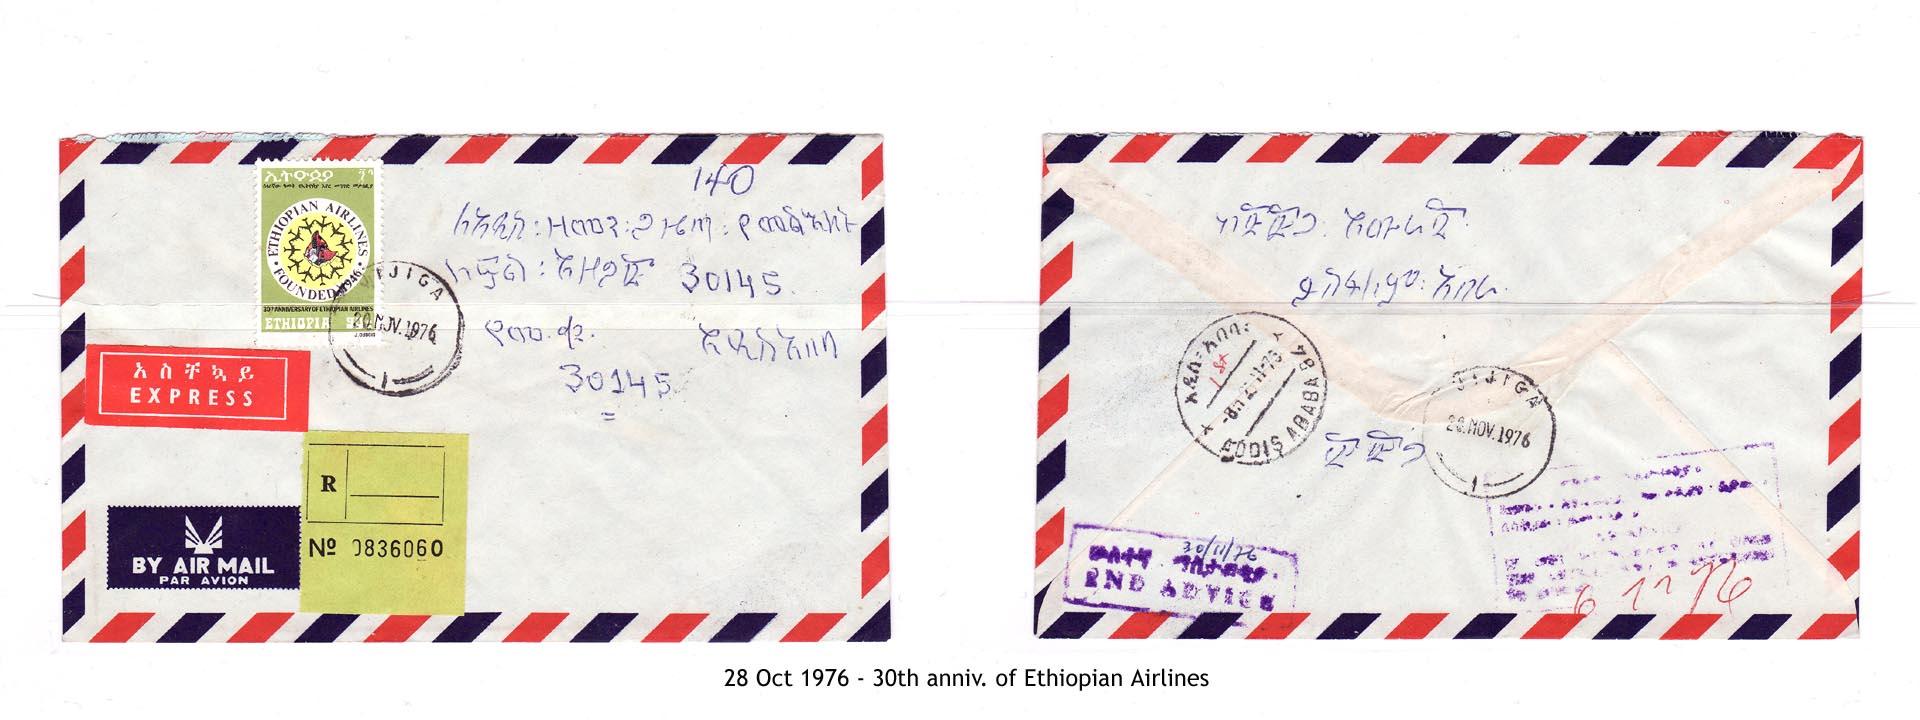 19761028 - 30th anniv. of Ethiopian Airlines